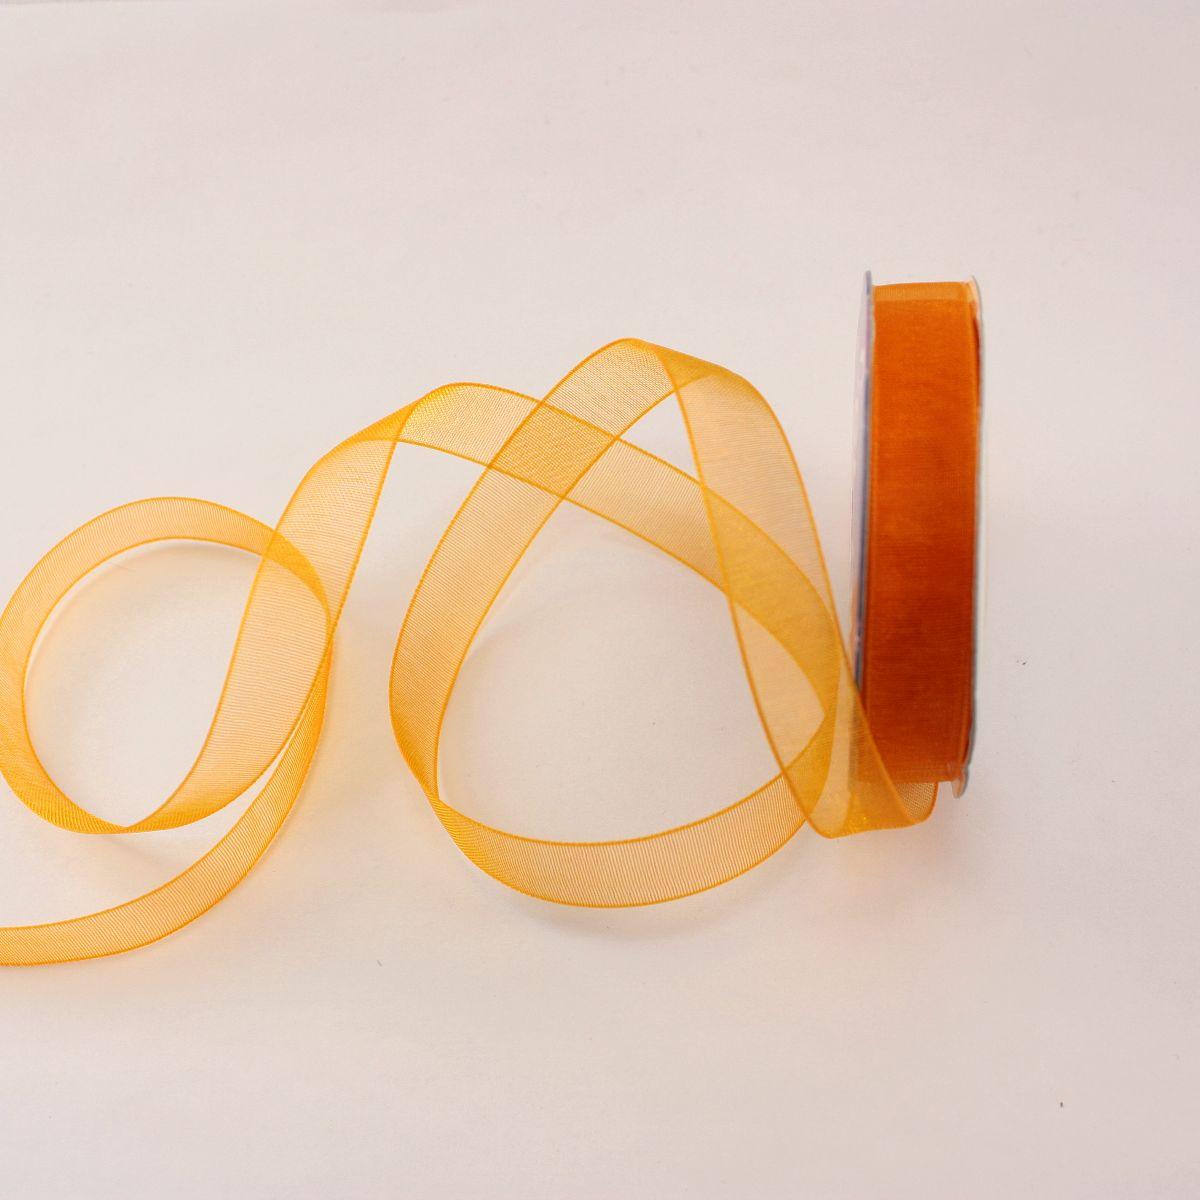 Ruban organdi en bobine abricot 9 mm